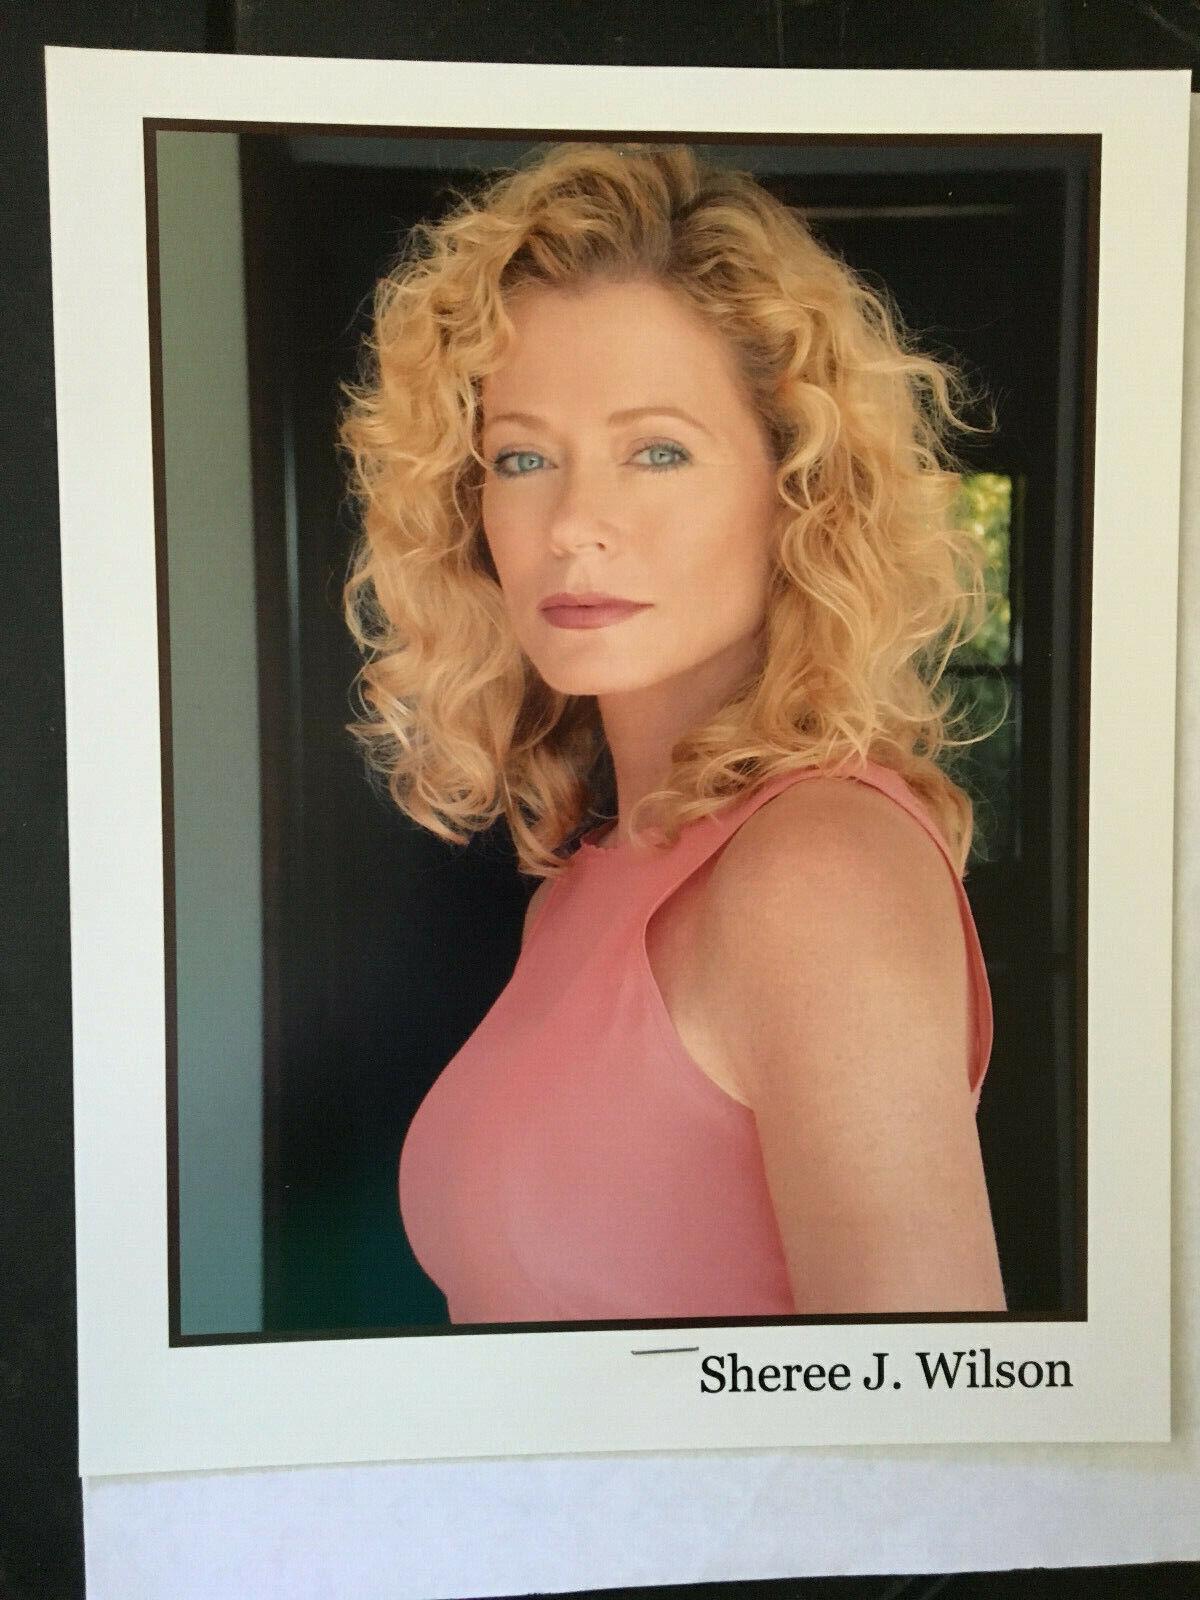 Sheree J. Wilson : sheree, wilson, Sheree, Wilson, Walker, Texas, Ranger, Vintage, Headshot, Photo, Credits